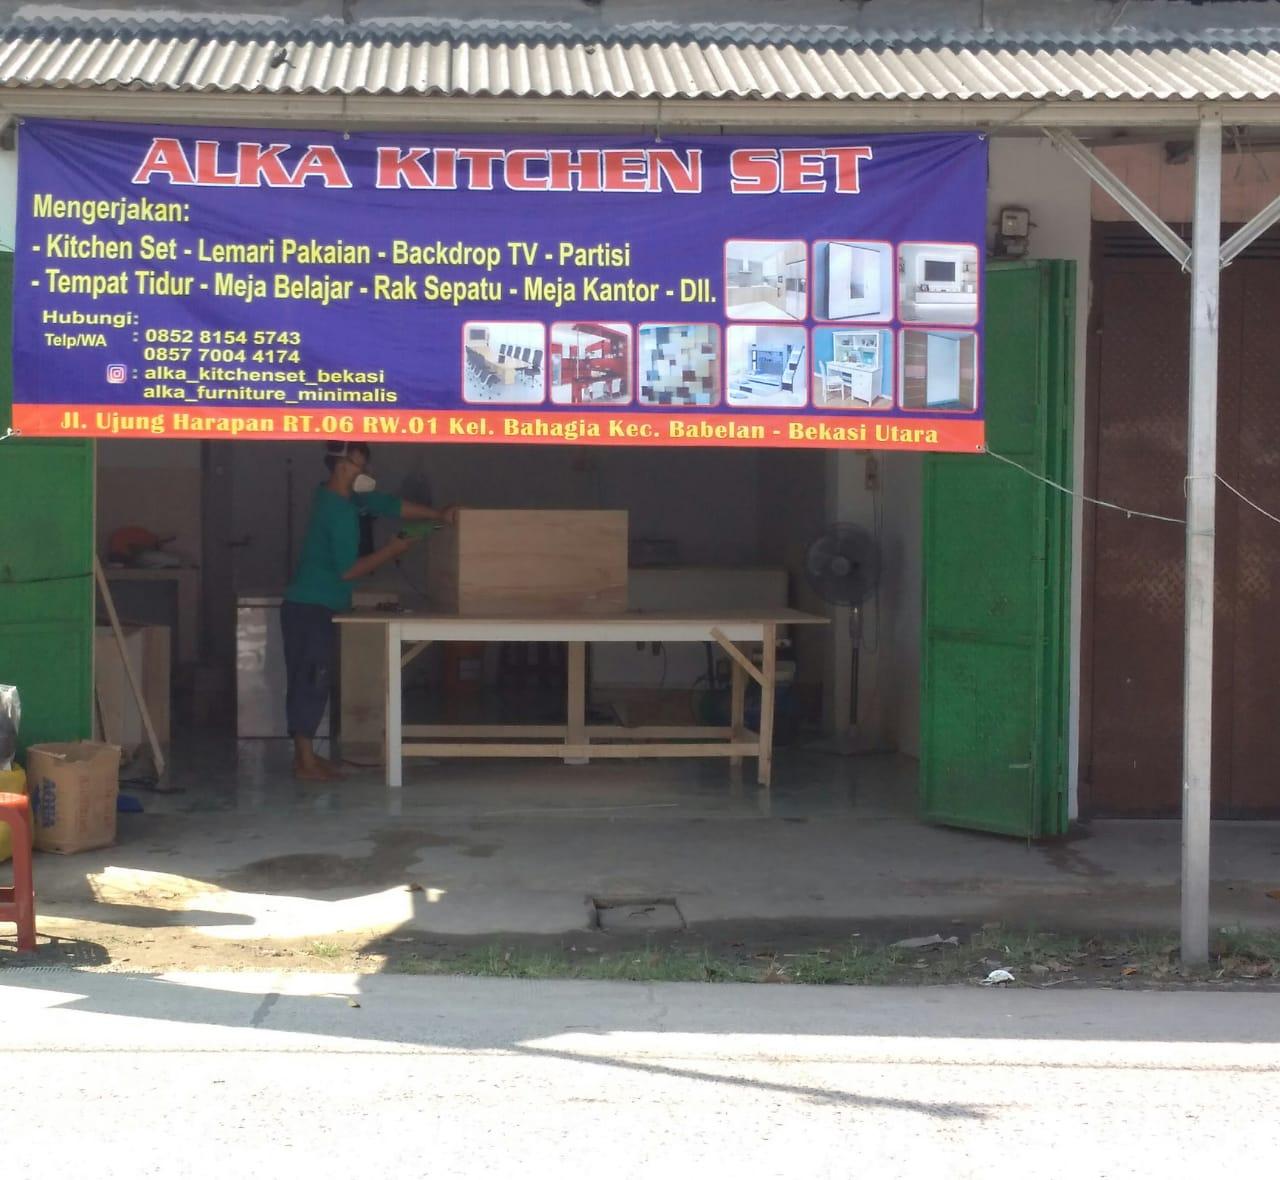 alka kitchen set bekasi - Lemari Pakaian HPL Minimalis Jakarta